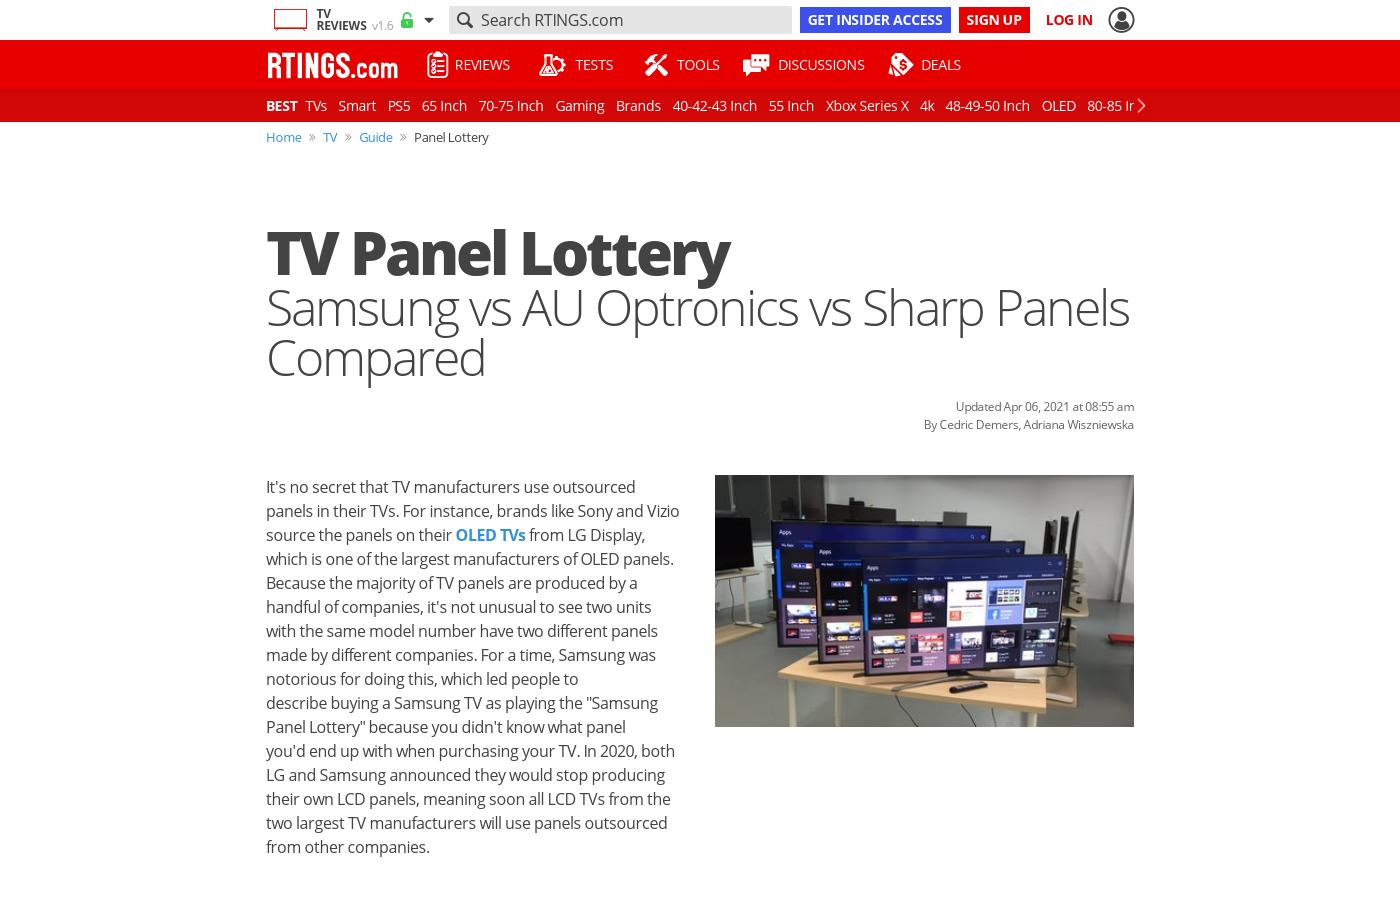 TV Panel Lottery: Samsung vs AU Optronics vs Sharp Panels